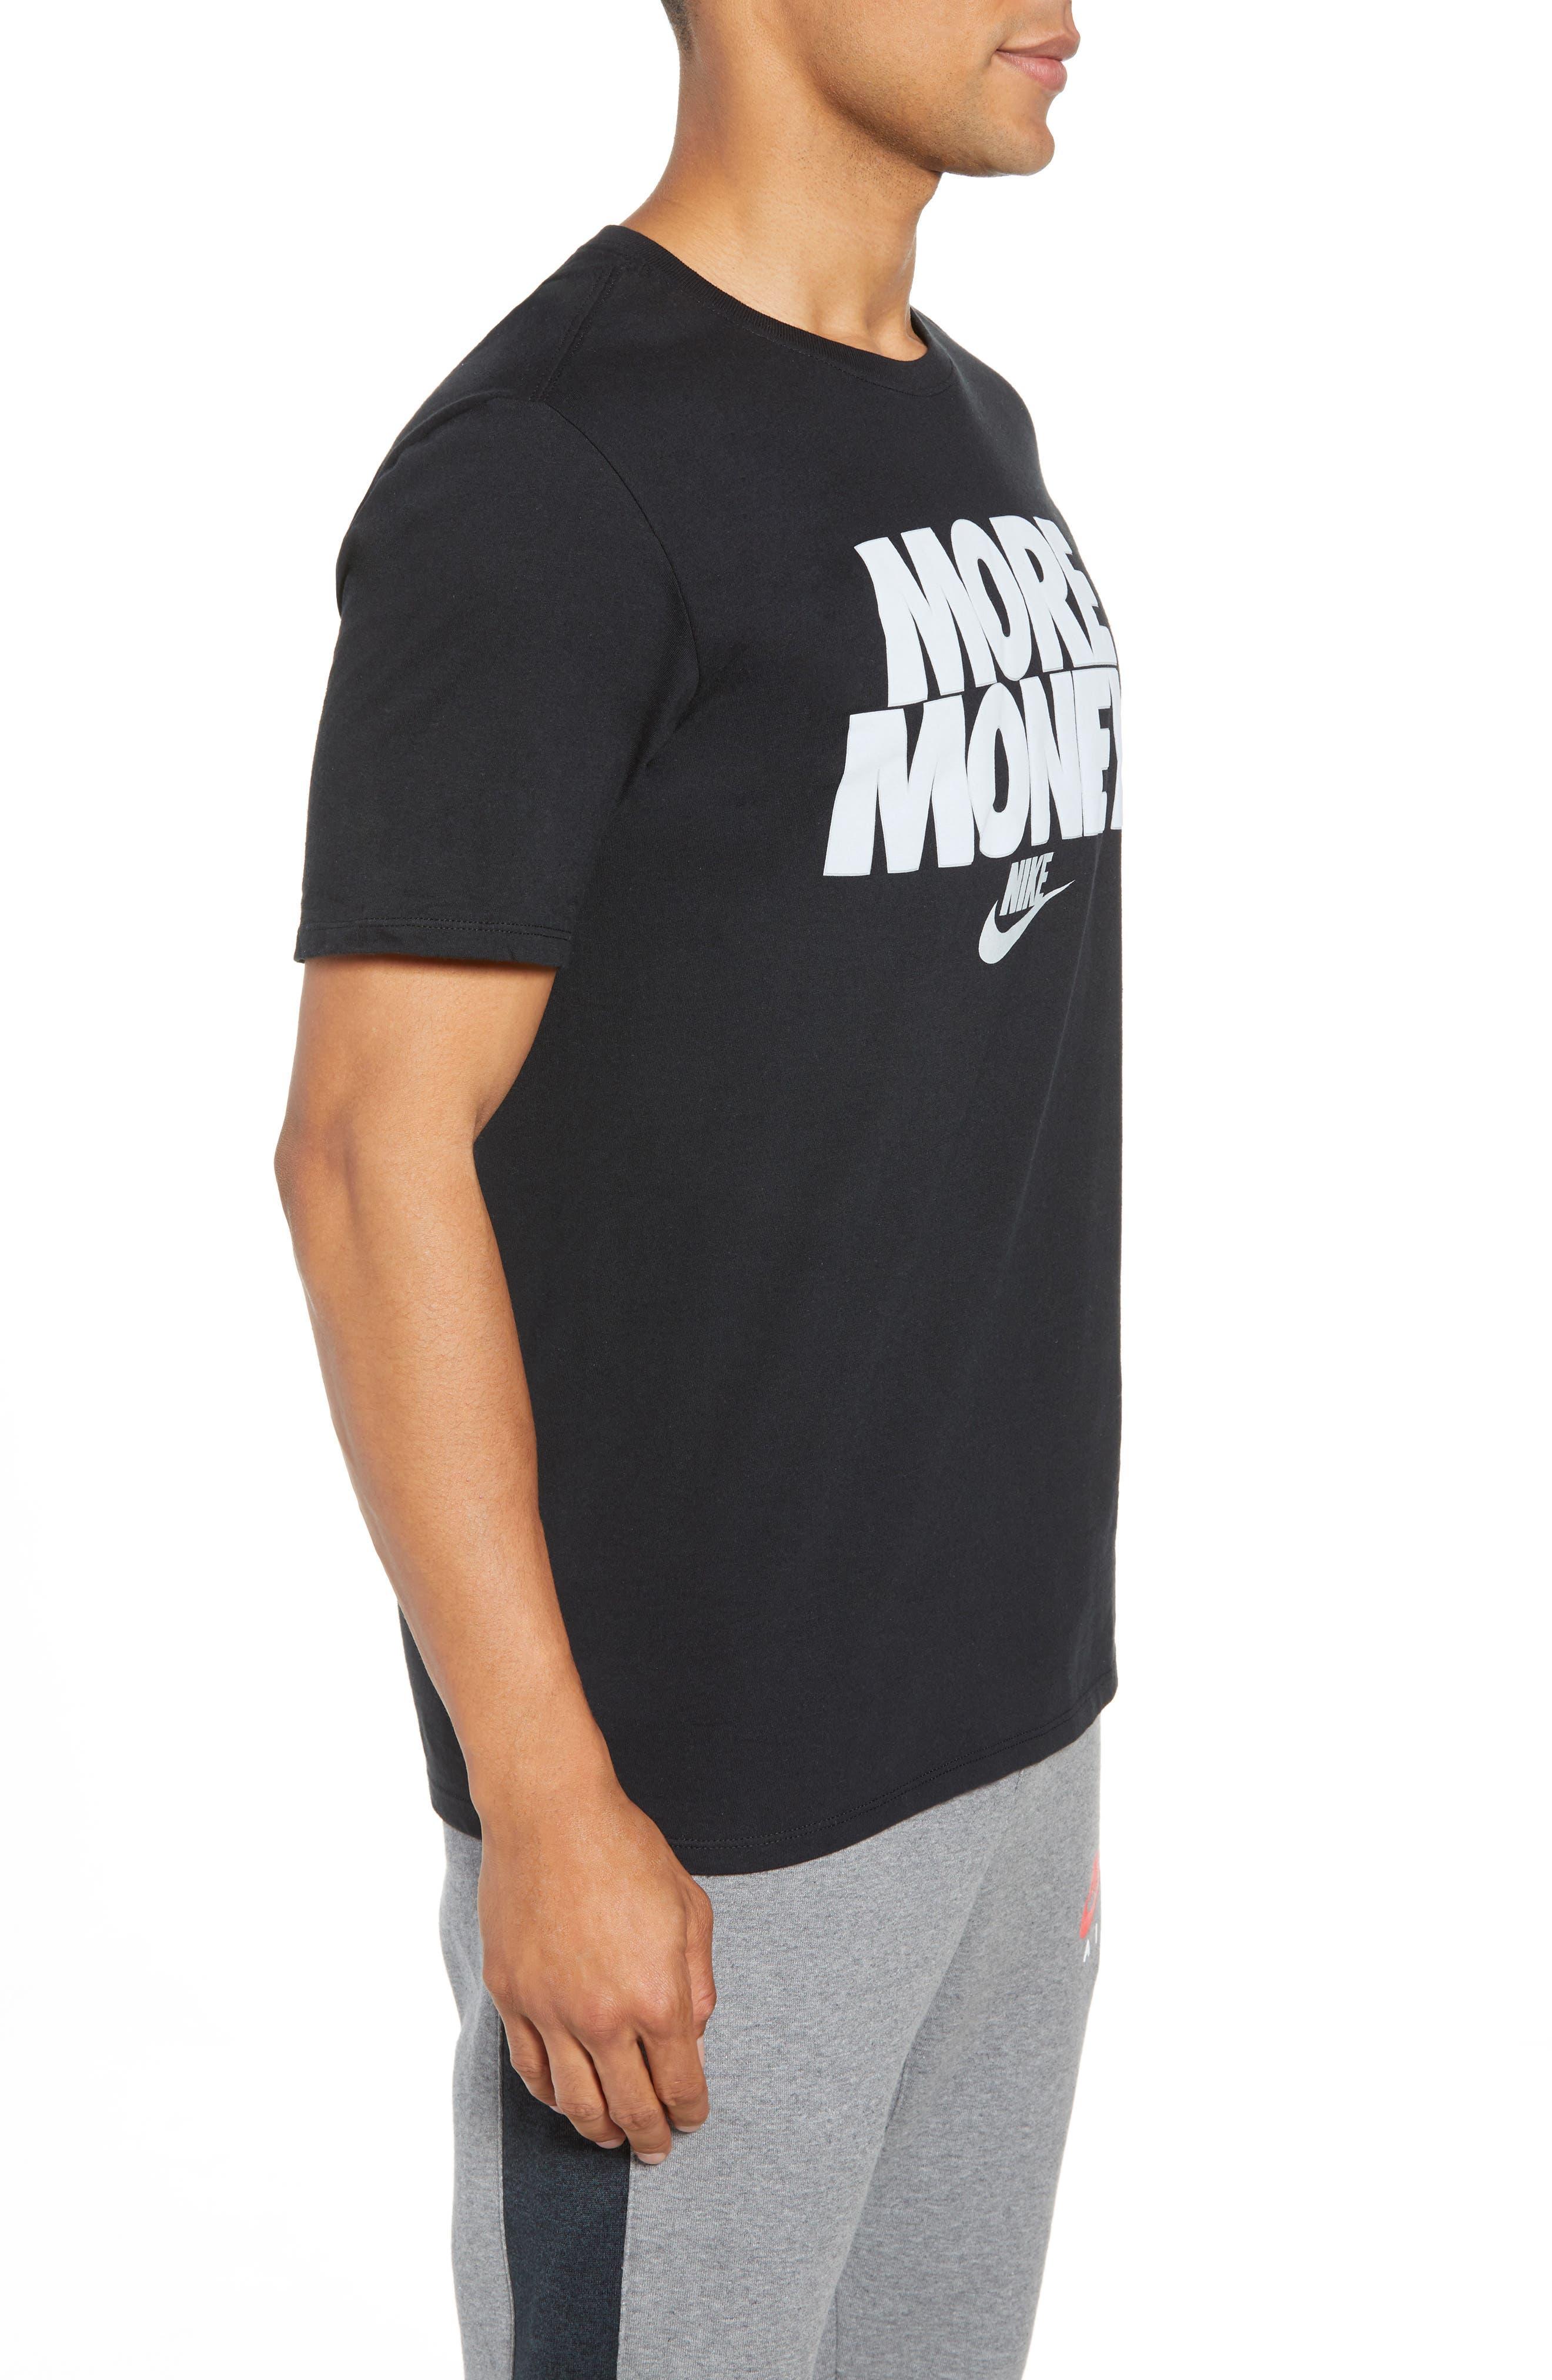 NIKE,                             Sportswear More Money T-Shirt,                             Alternate thumbnail 3, color,                             010